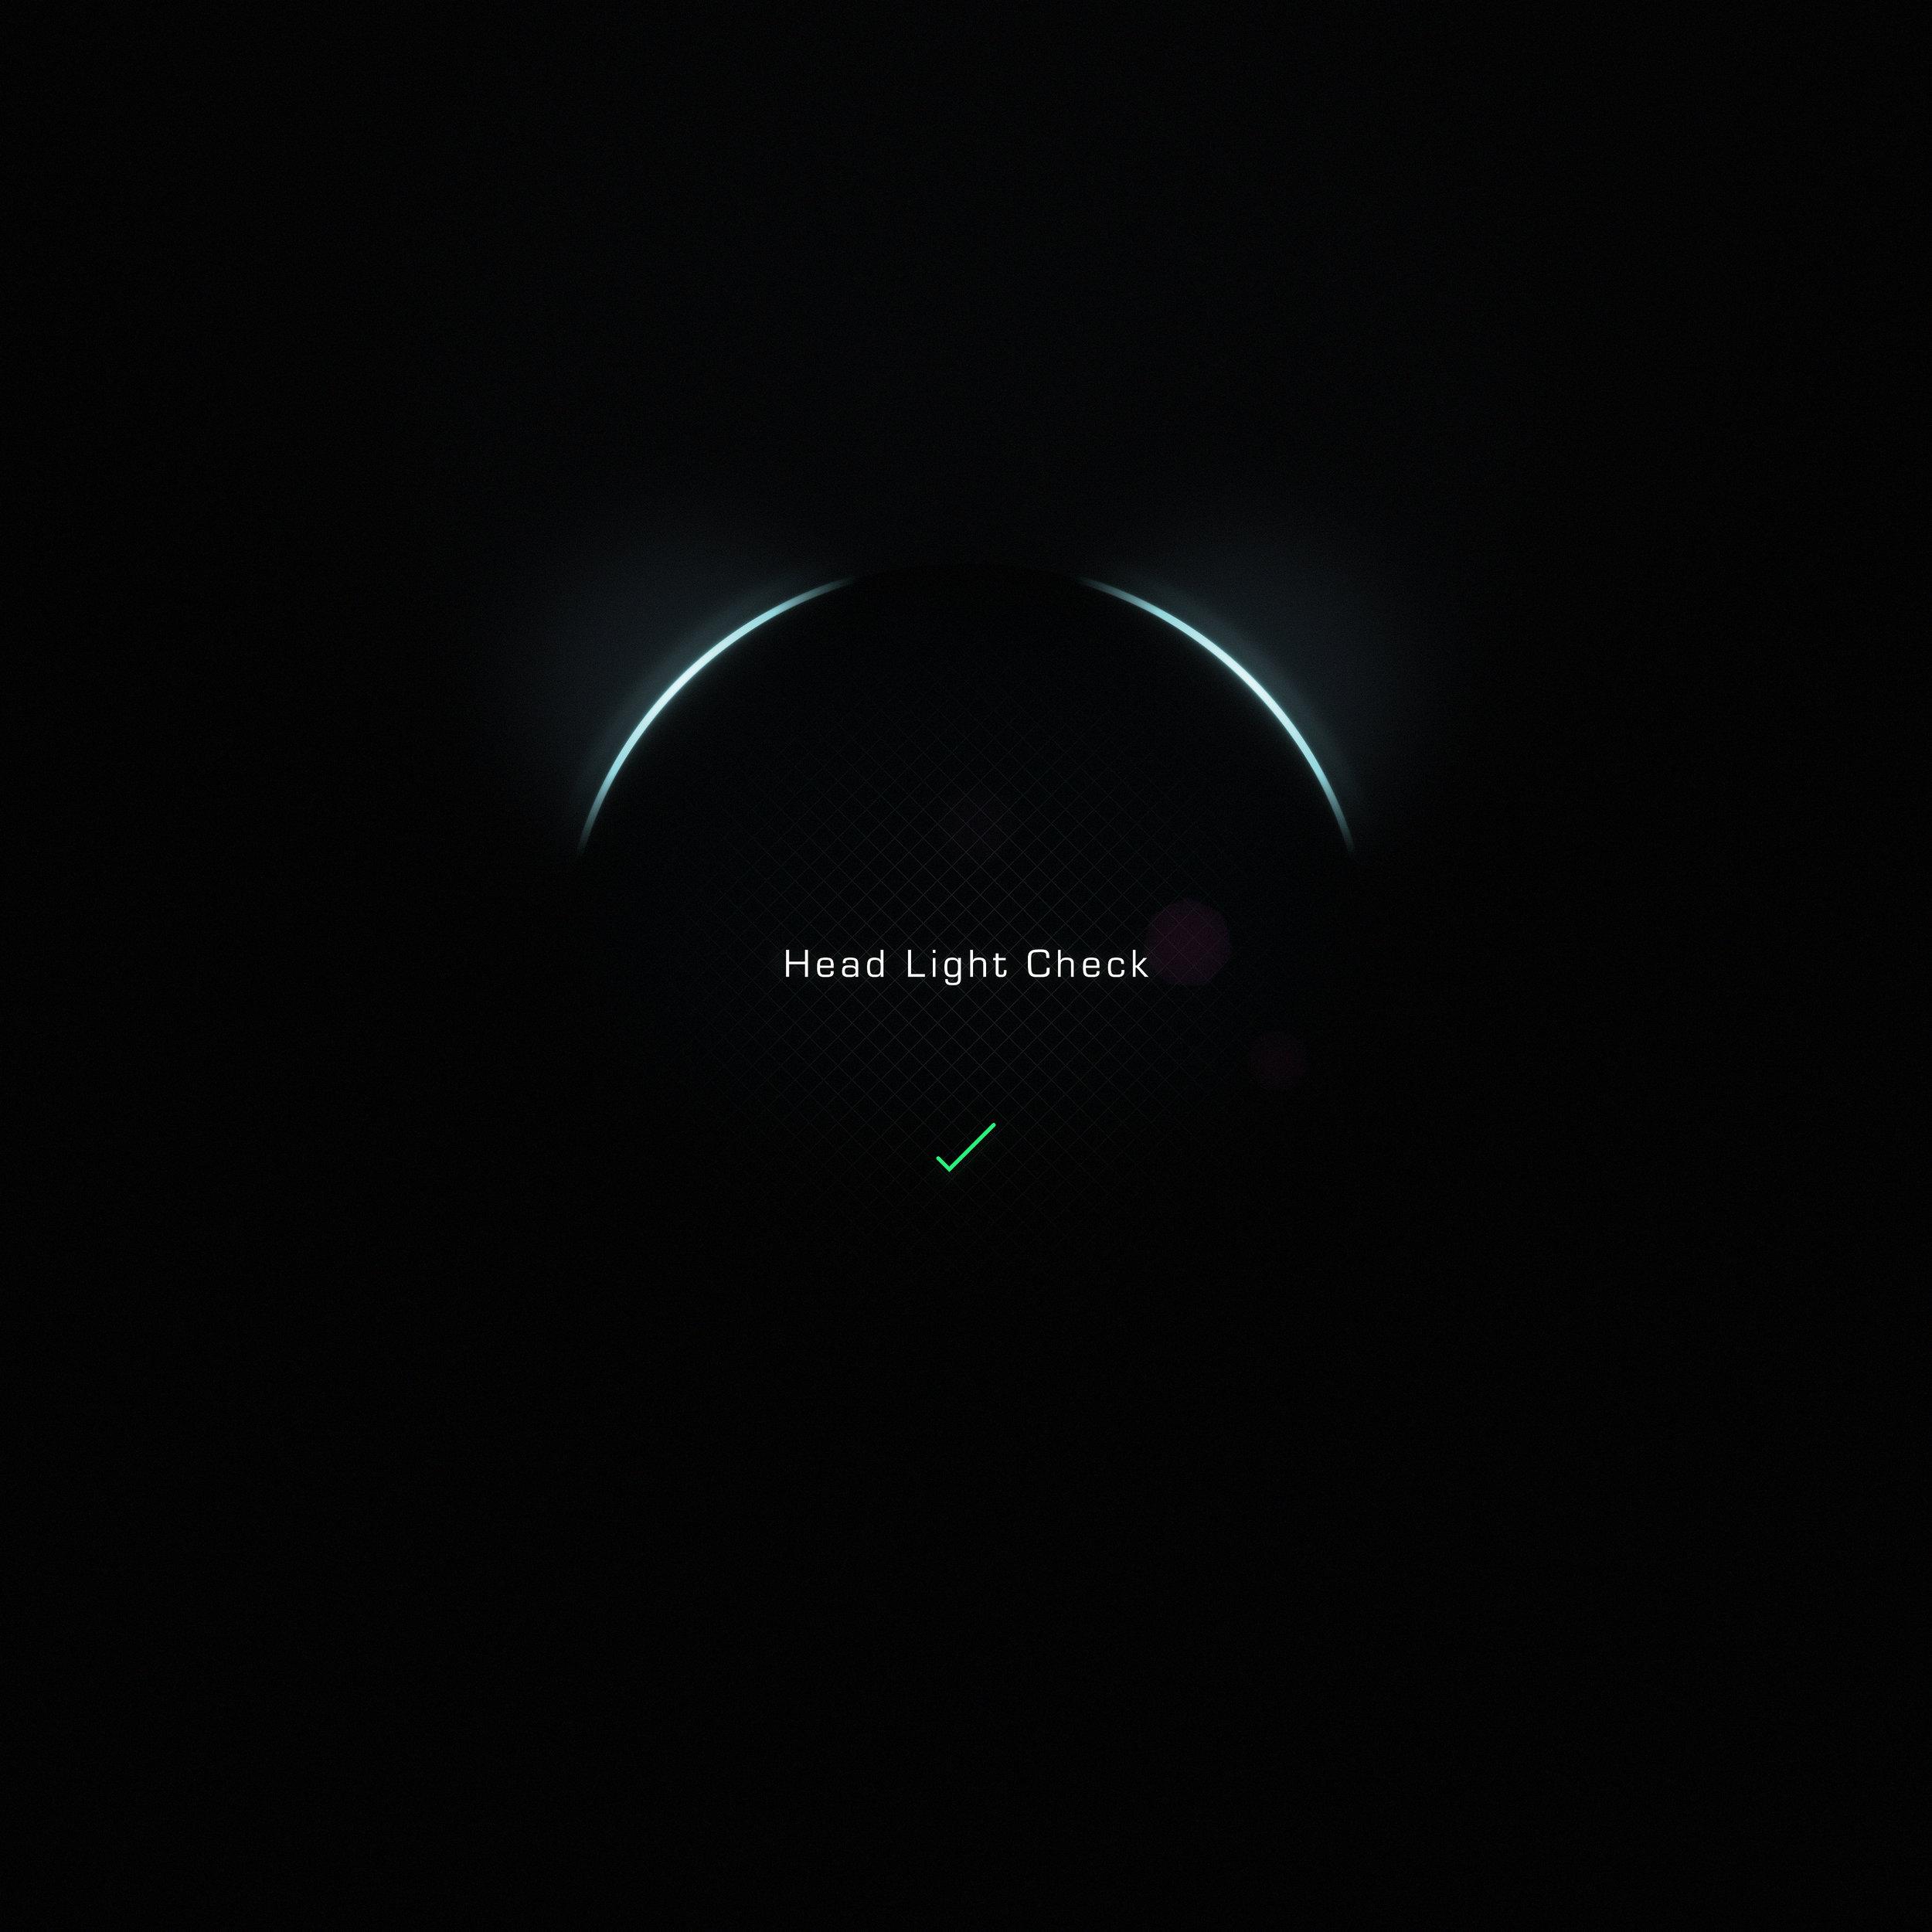 Valeo_LightCheck_01_Treated_01.jpg